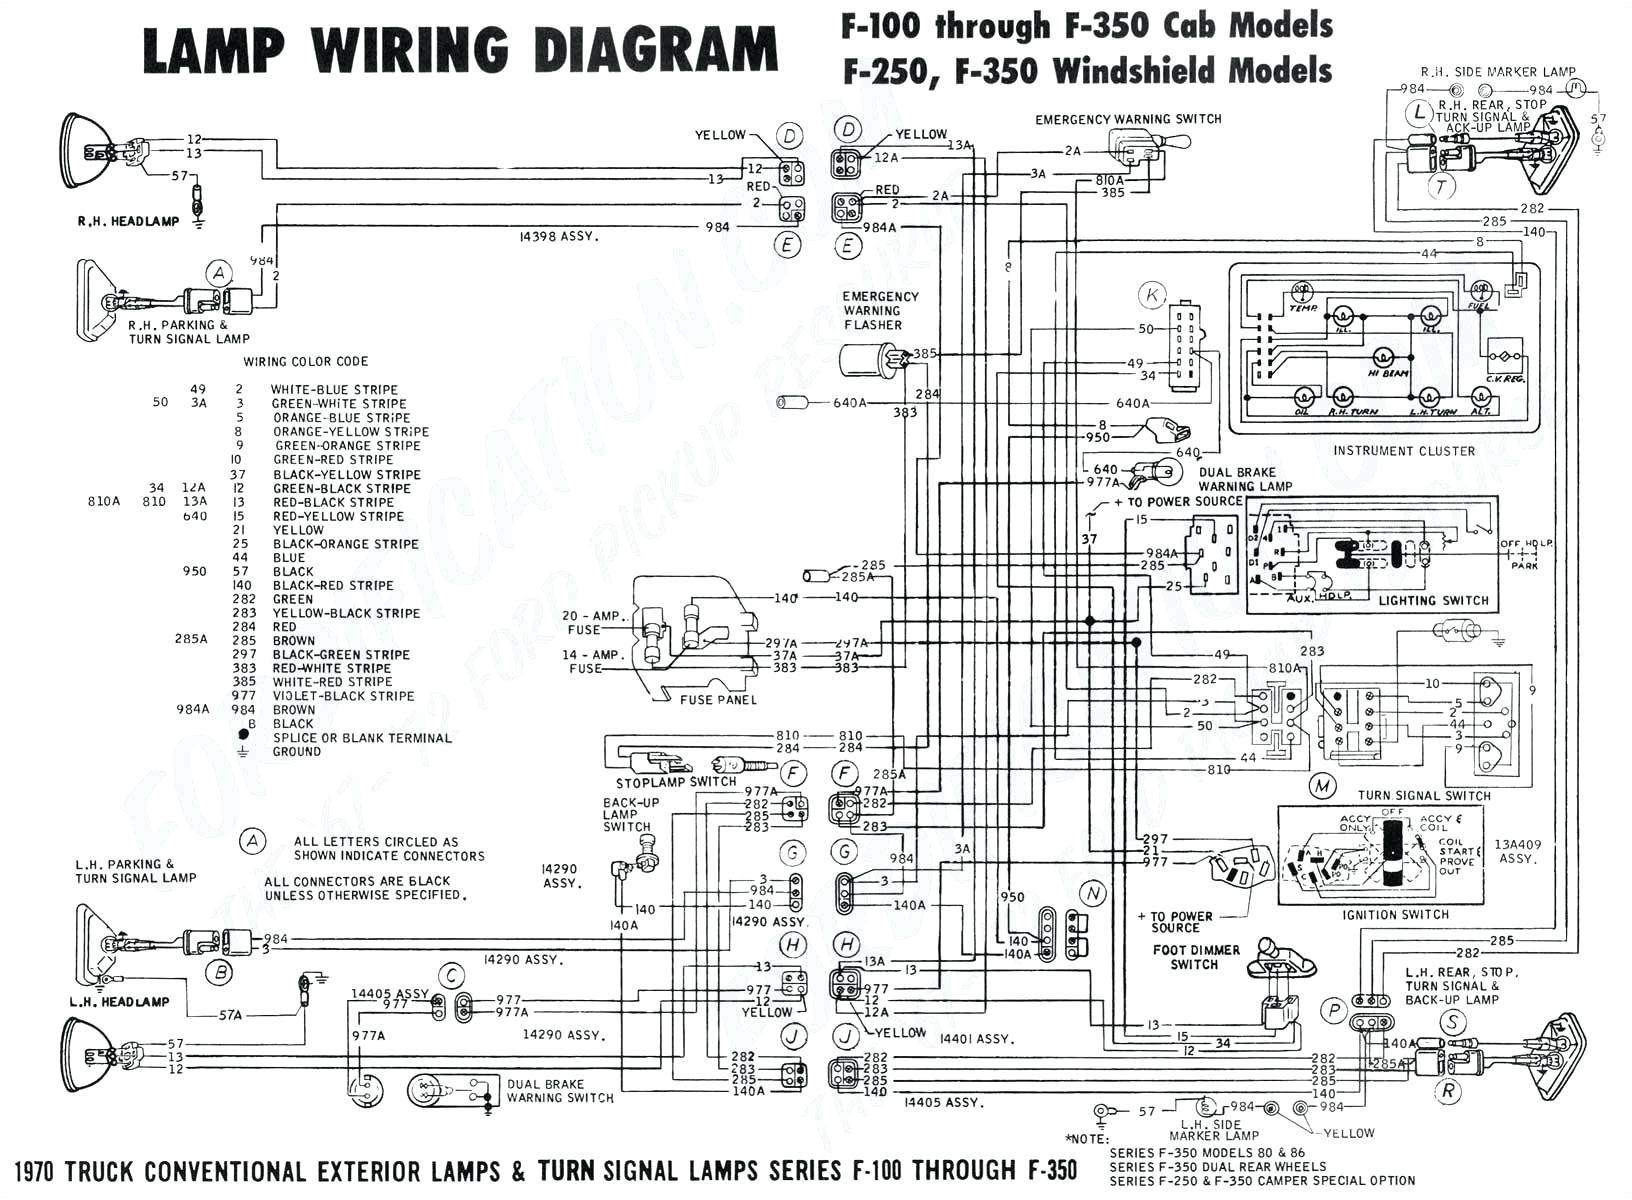 coachmen rv wiring diagrams wiring diagram article review21b 2012 coachmen rv wiring diagram wiring diagram local